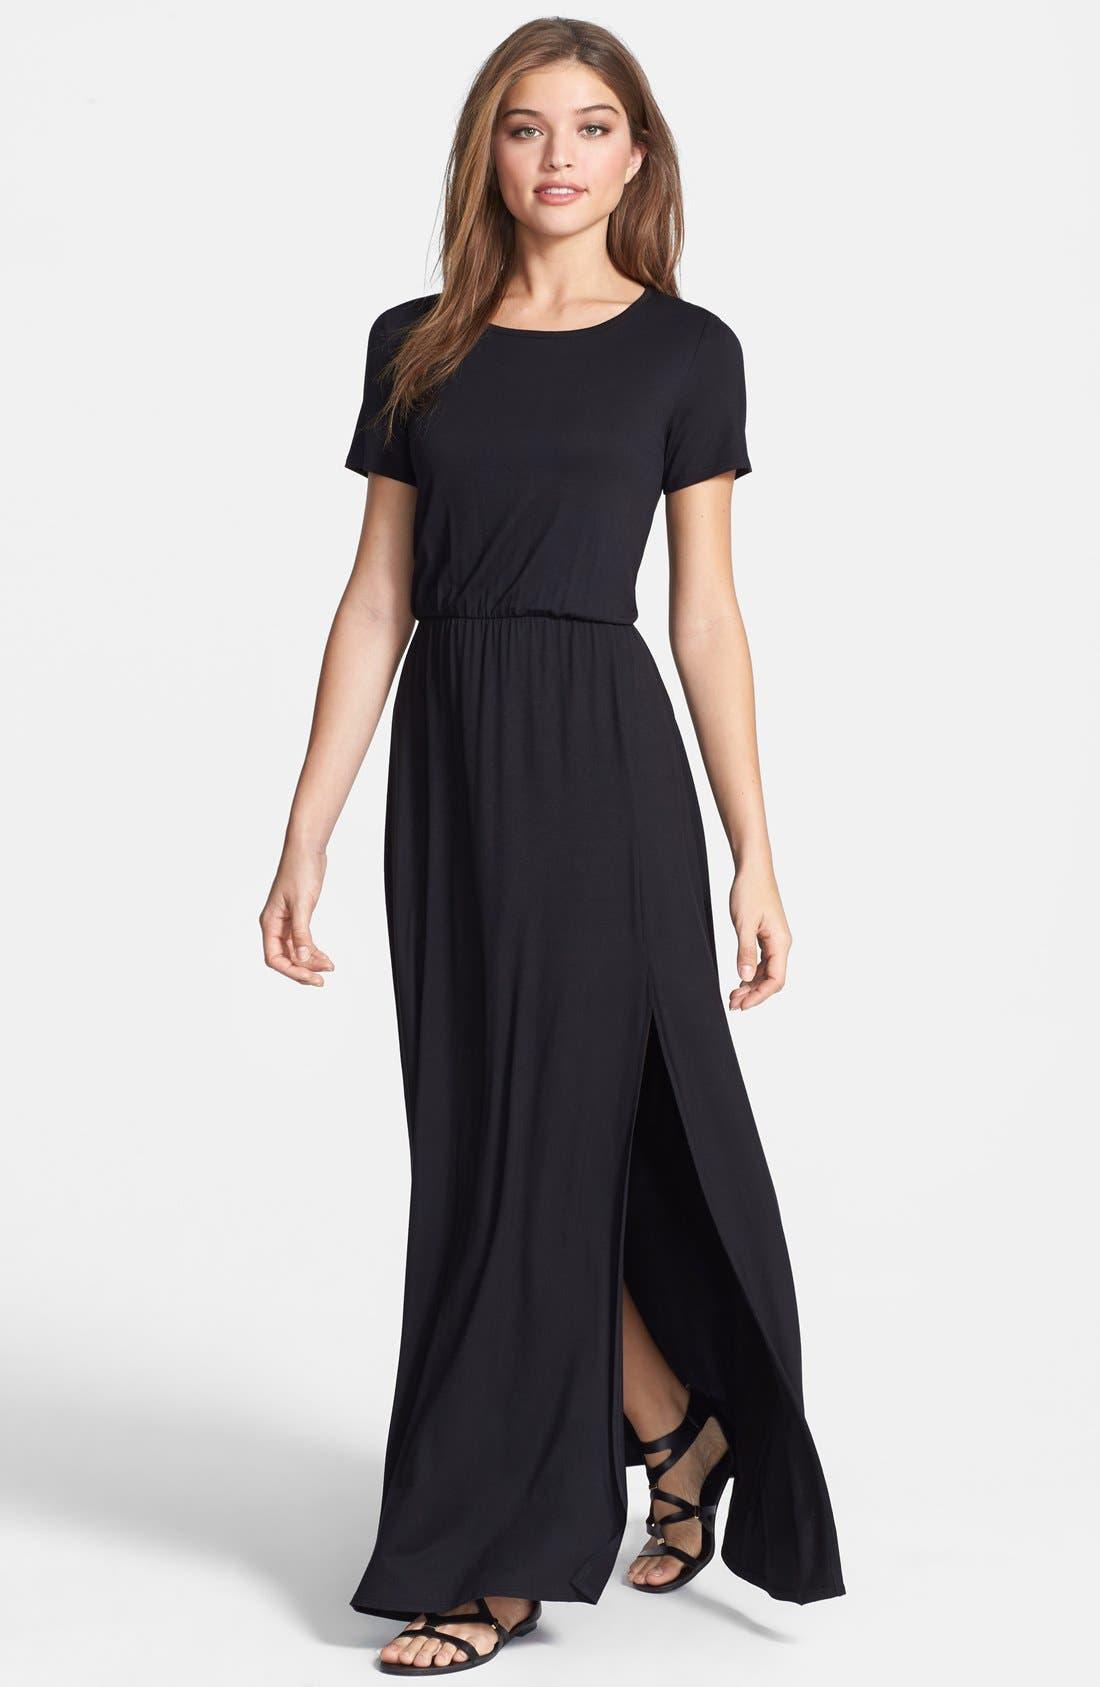 Main Image - Loveappella Cinch Waist Stretch Knit Maxi Dress